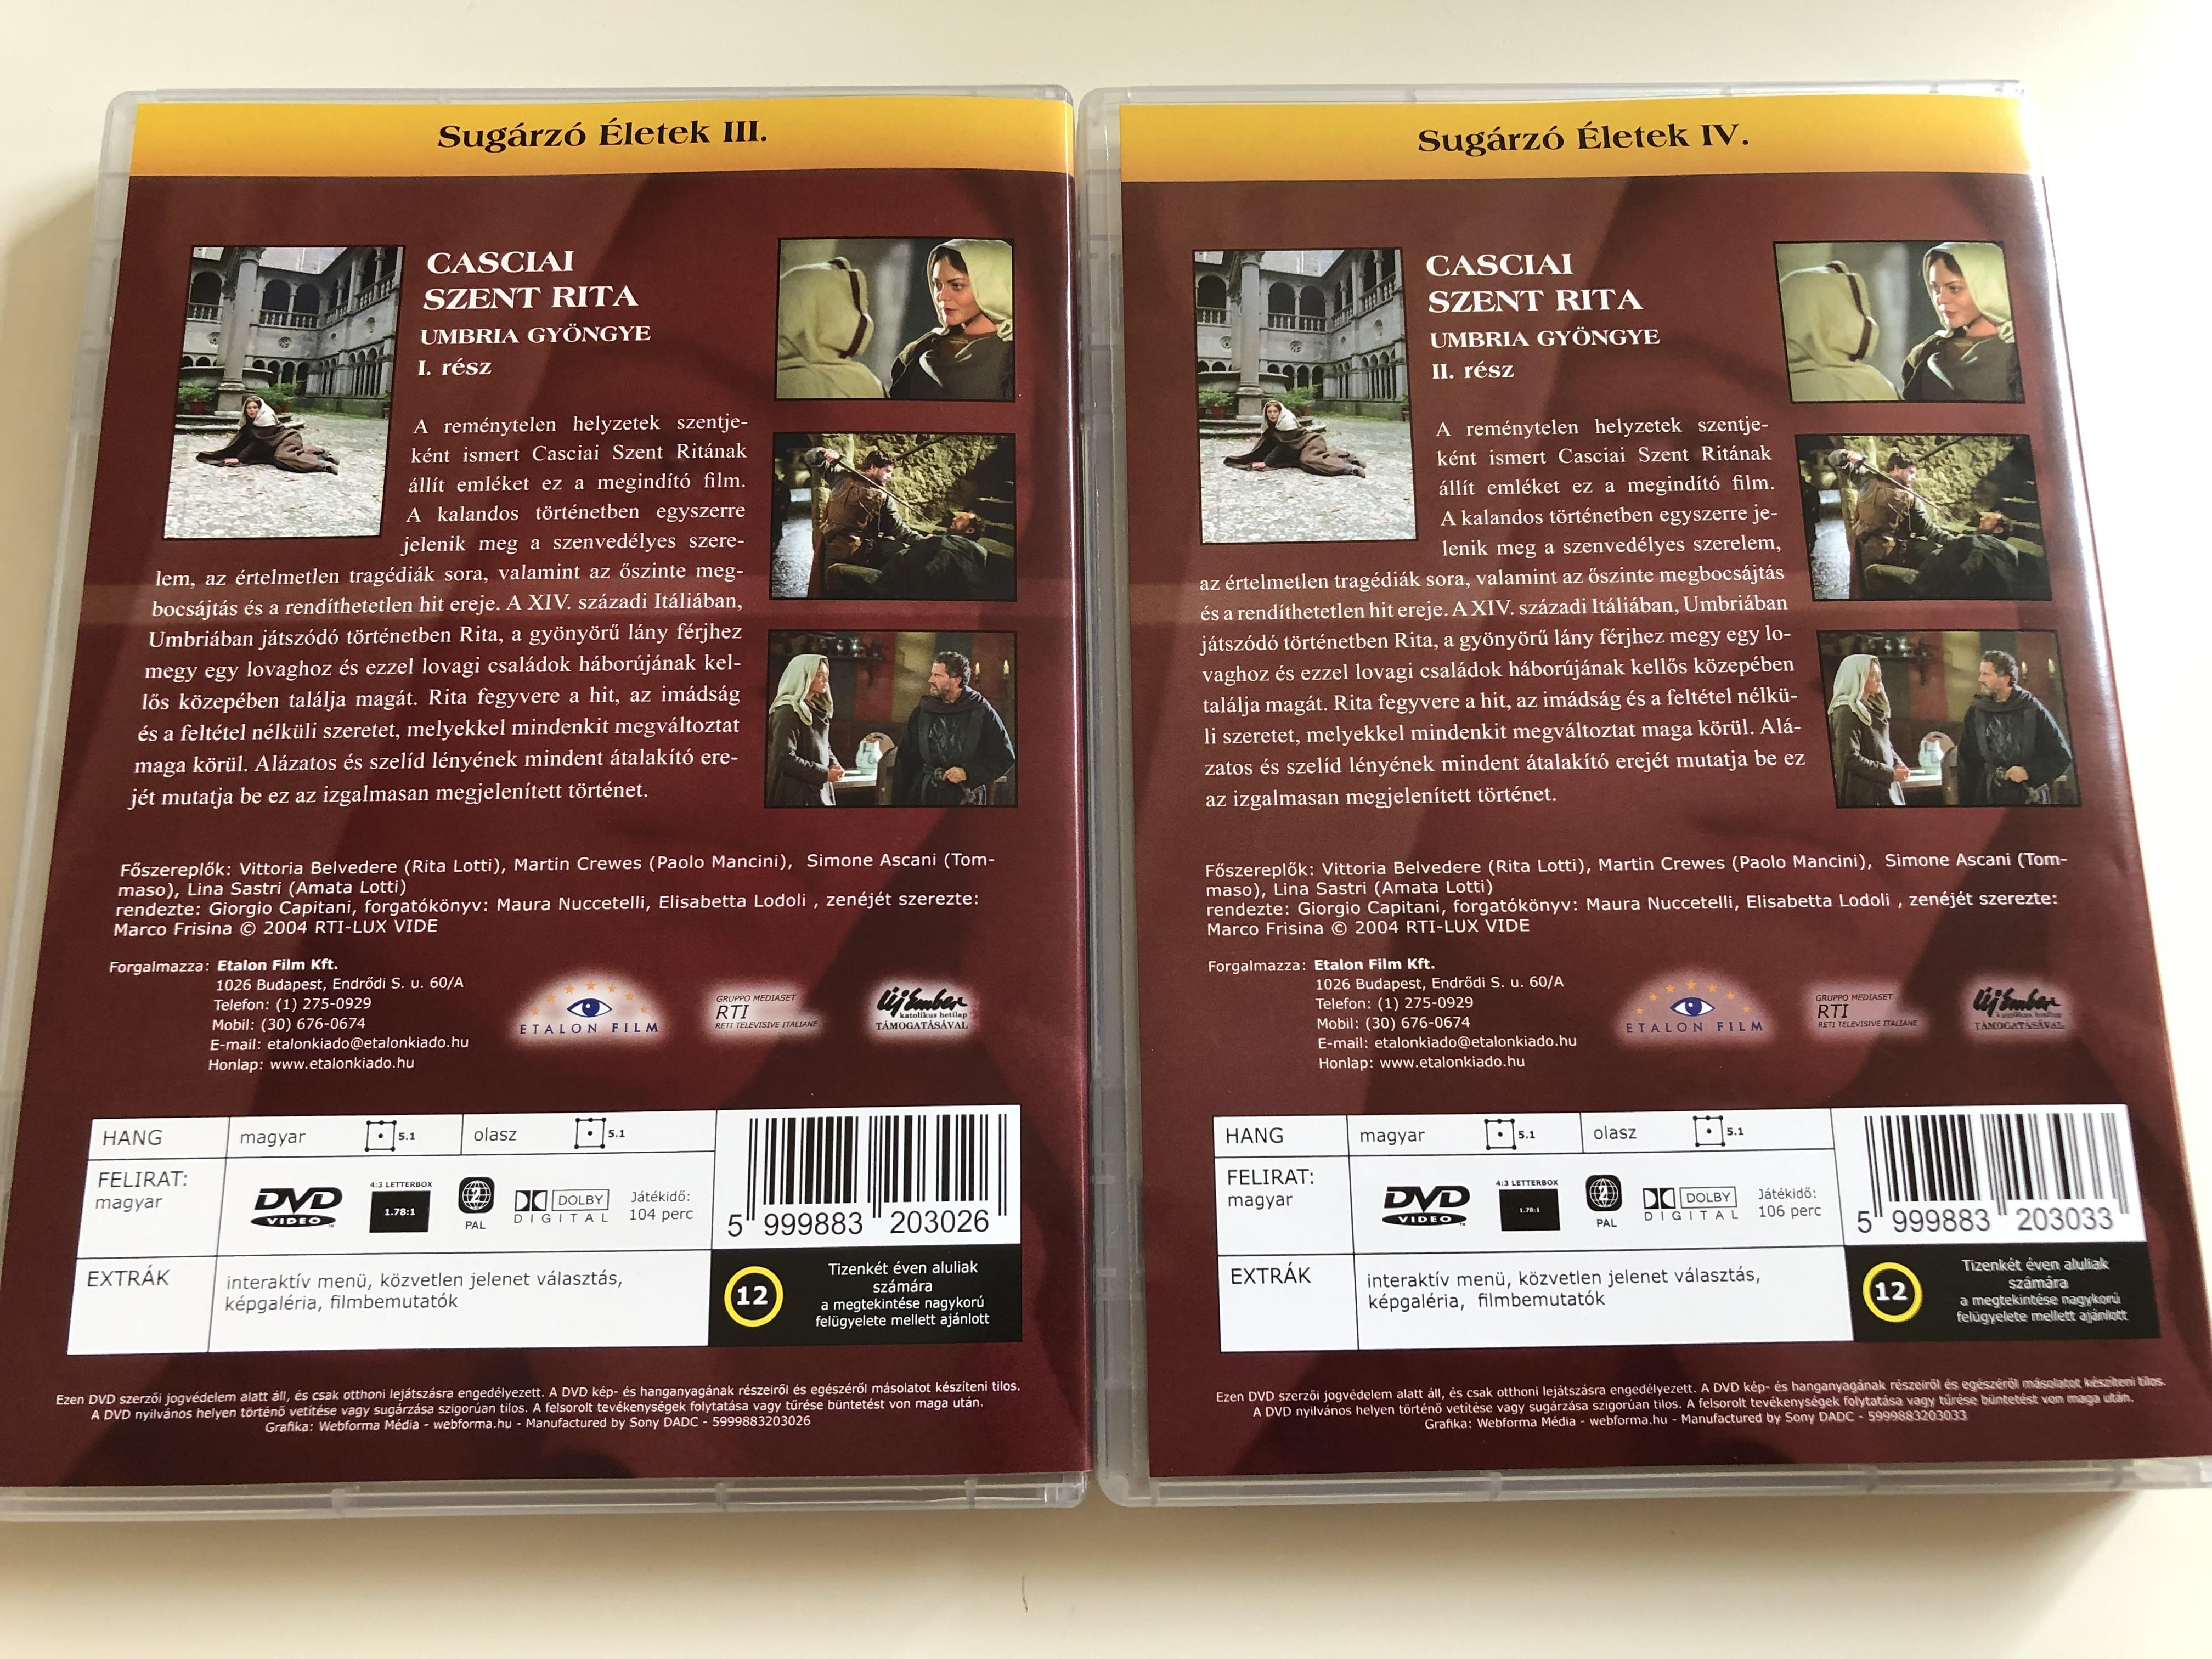 rita-da-cascia-i-ii-dvd-set-2004-casciai-szent-rita-umbria-gy-ngye-i-s-ii.-r-sz-directed-by-giorgio-capitani-starring-vittoria-belvedere-martin-crewes-dietrich-hollinderb-umer-lina-sastri-sug-rz-letek-sorozat-iii-.jpg